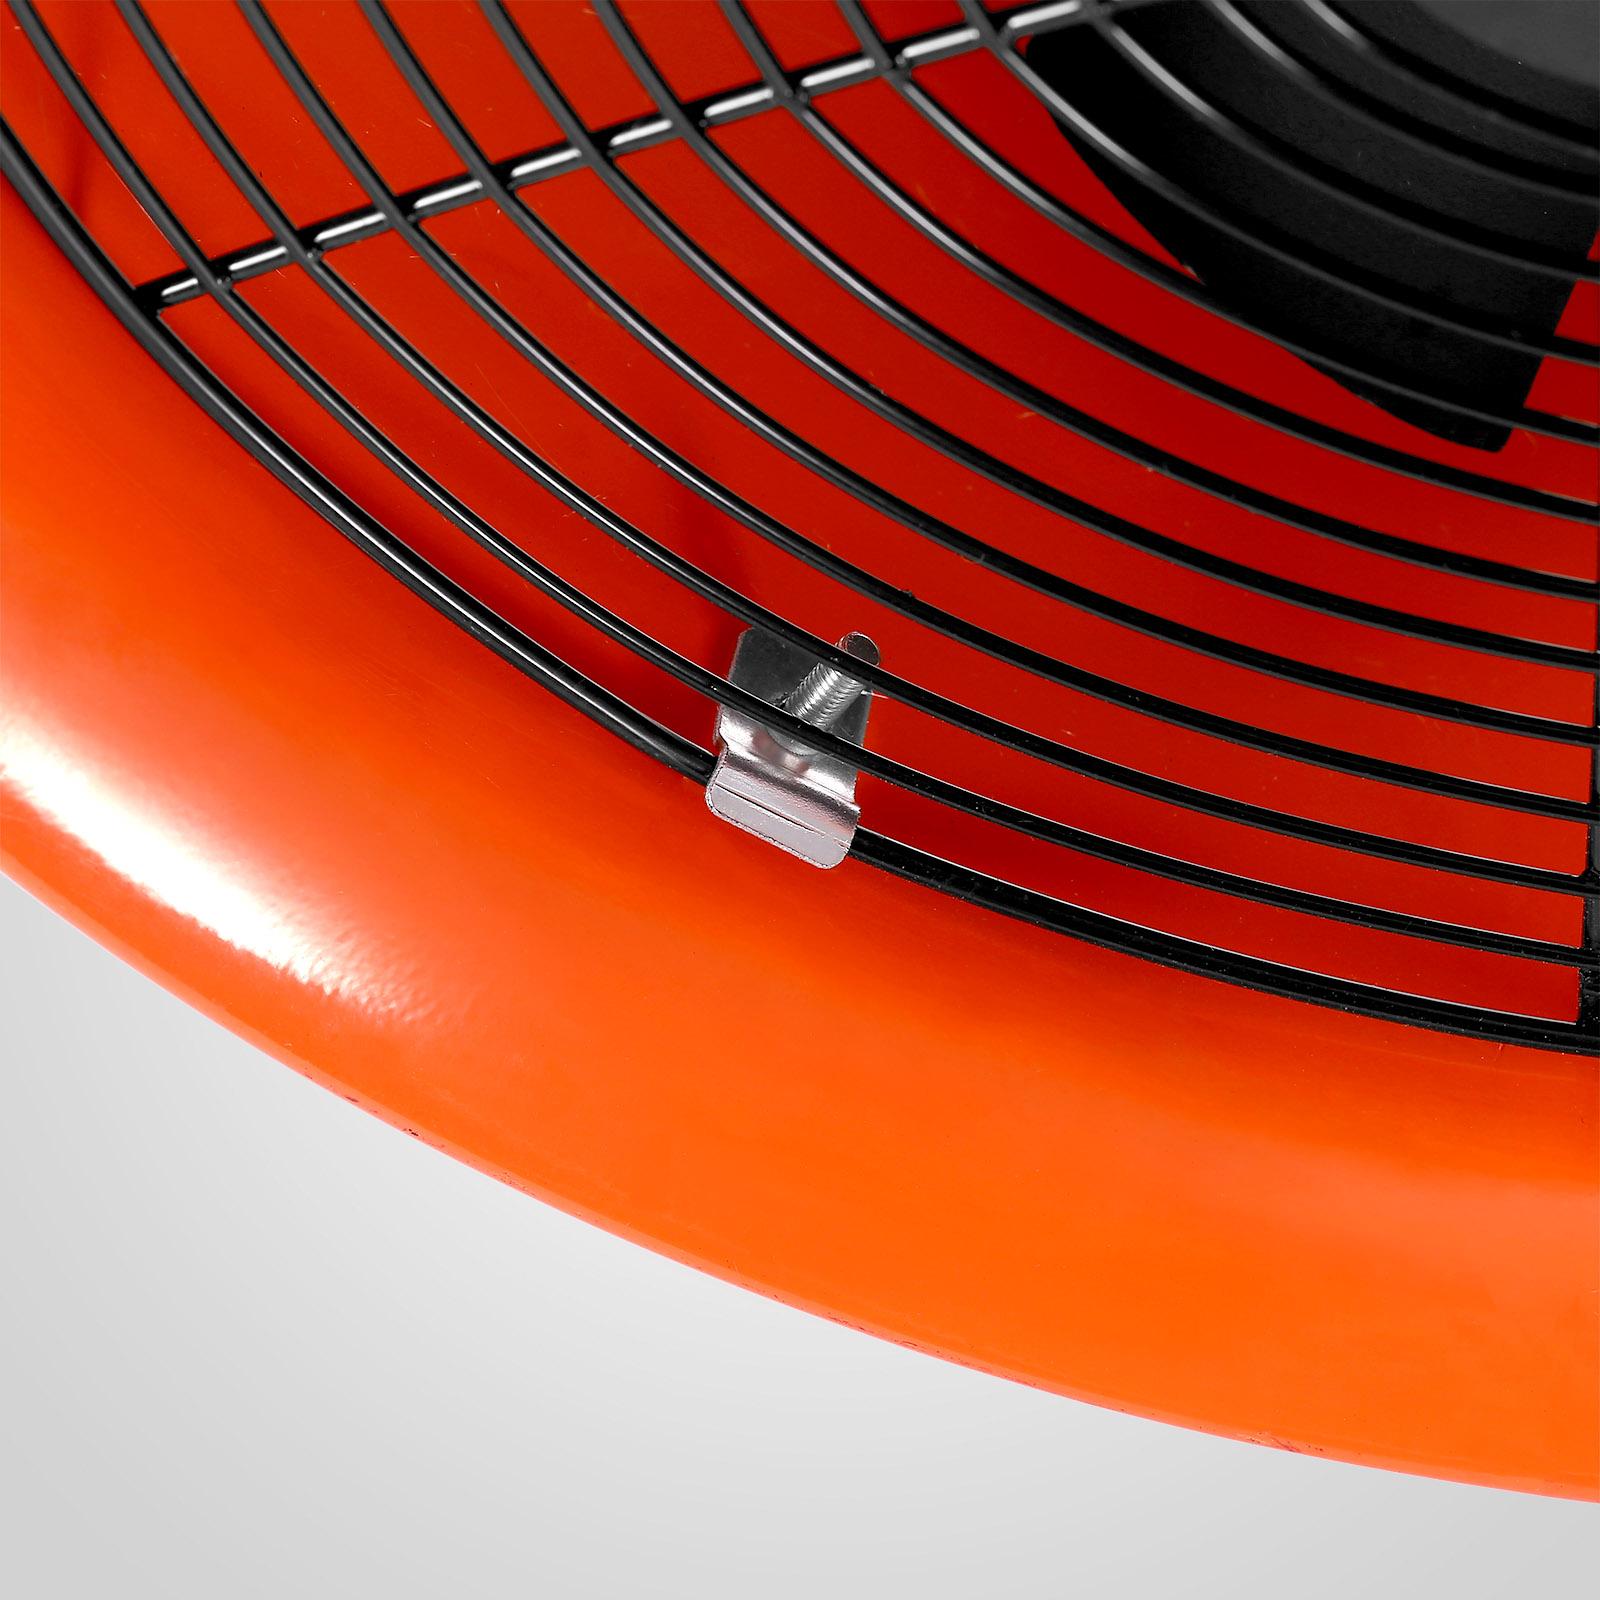 Blower Fan With Hose : Extractor fan blower portable m duct hose ventilator